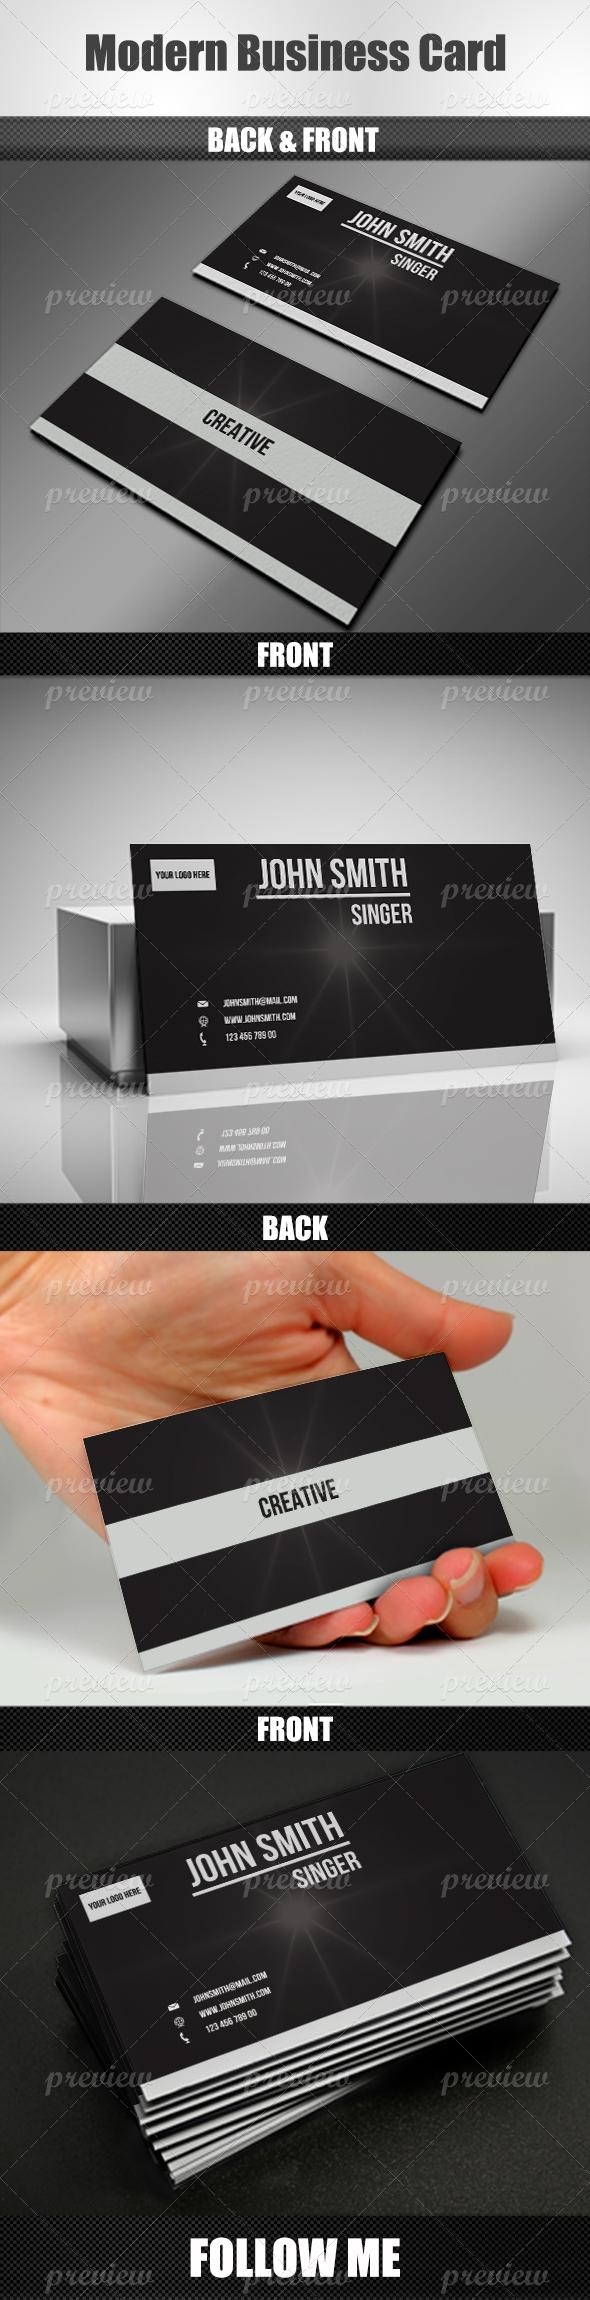 Modern Business Card v2